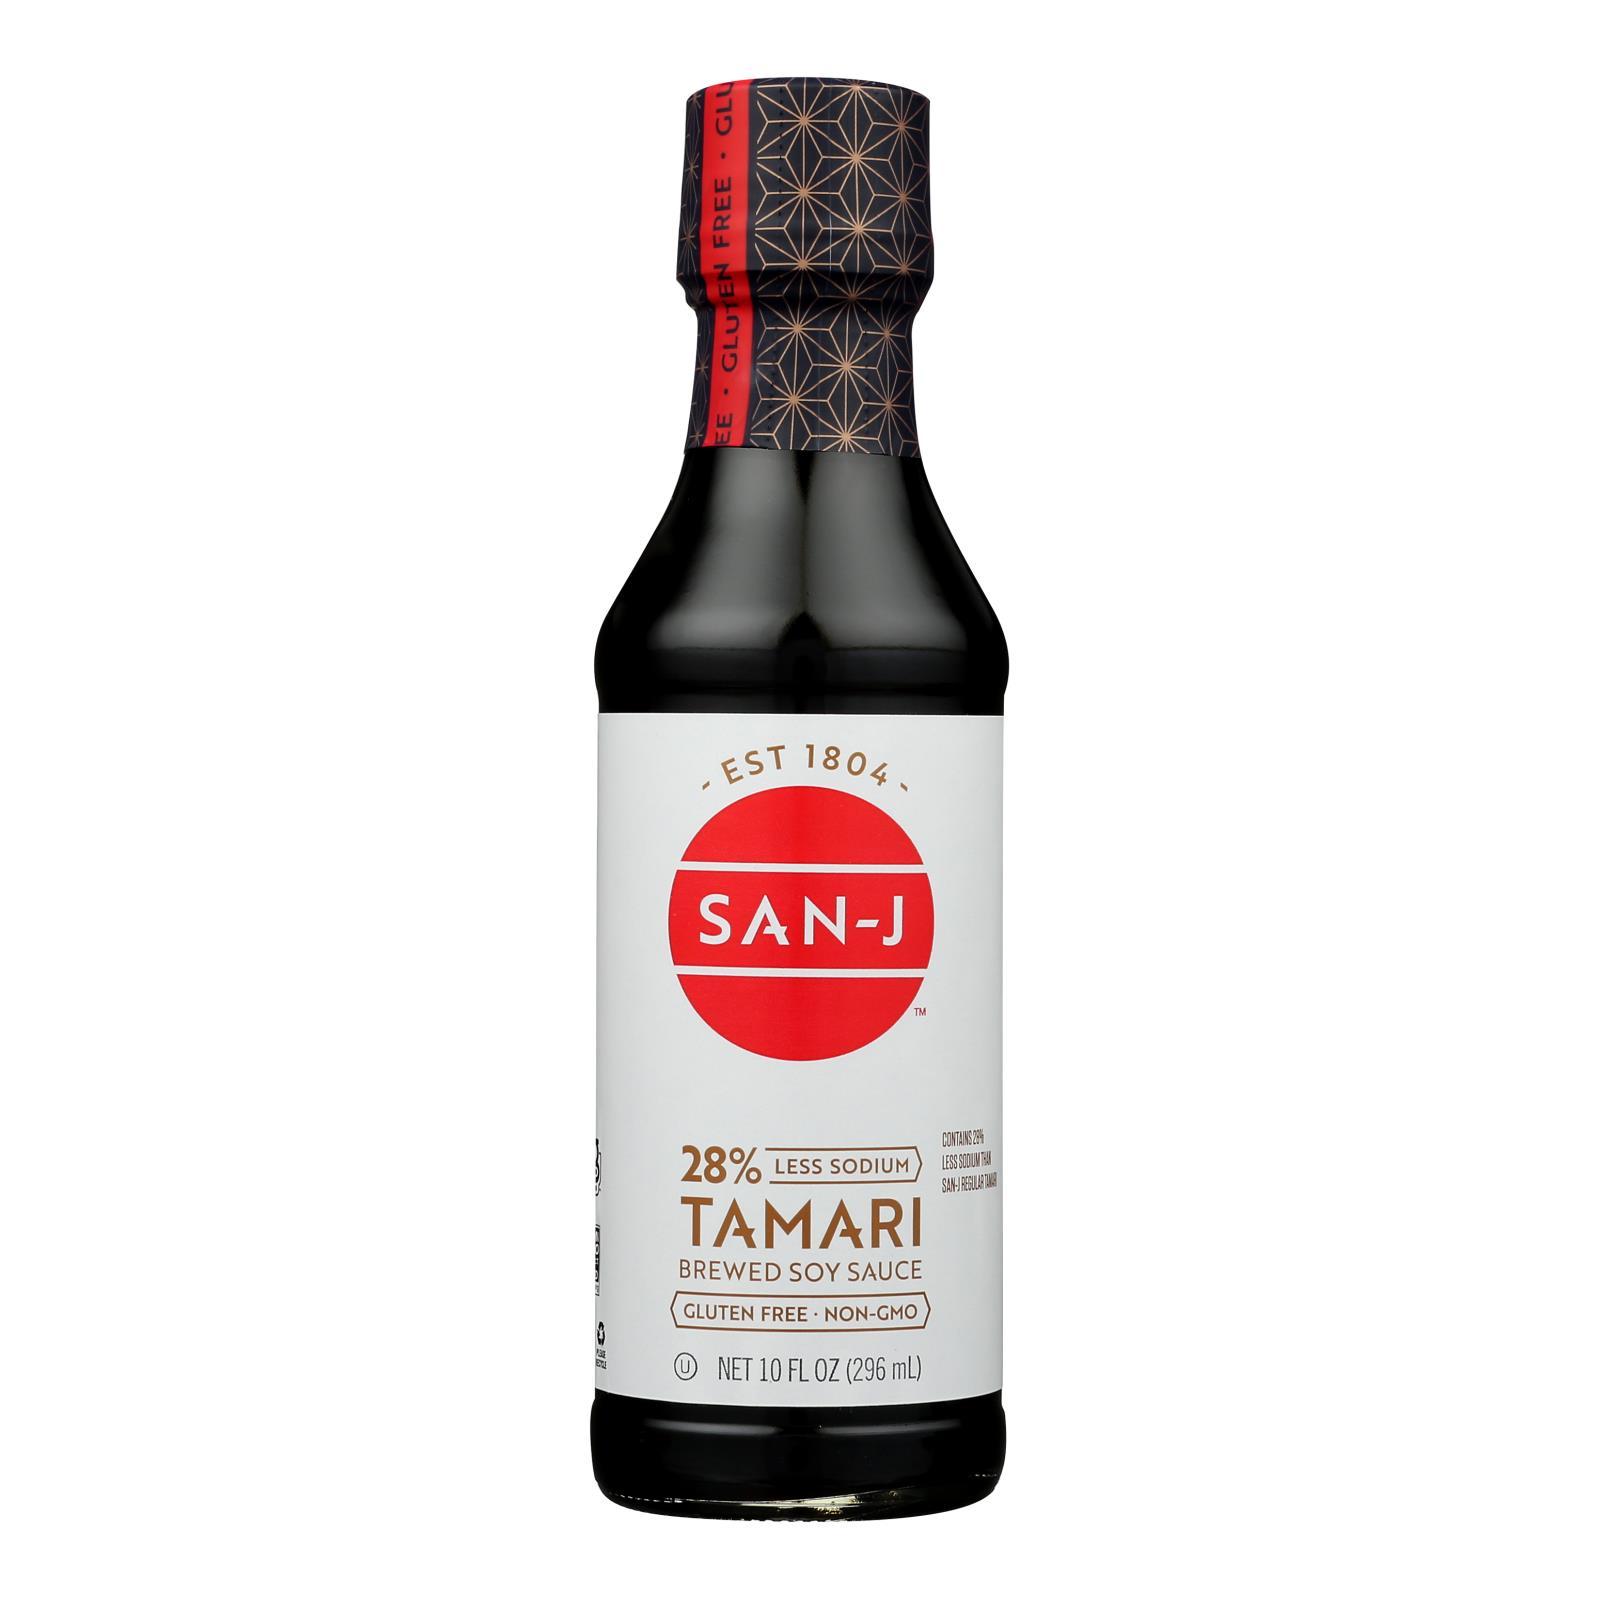 San - J Tamari Soy Sauce - Reduced Sodium - Case of 6 - 10 Fl oz.